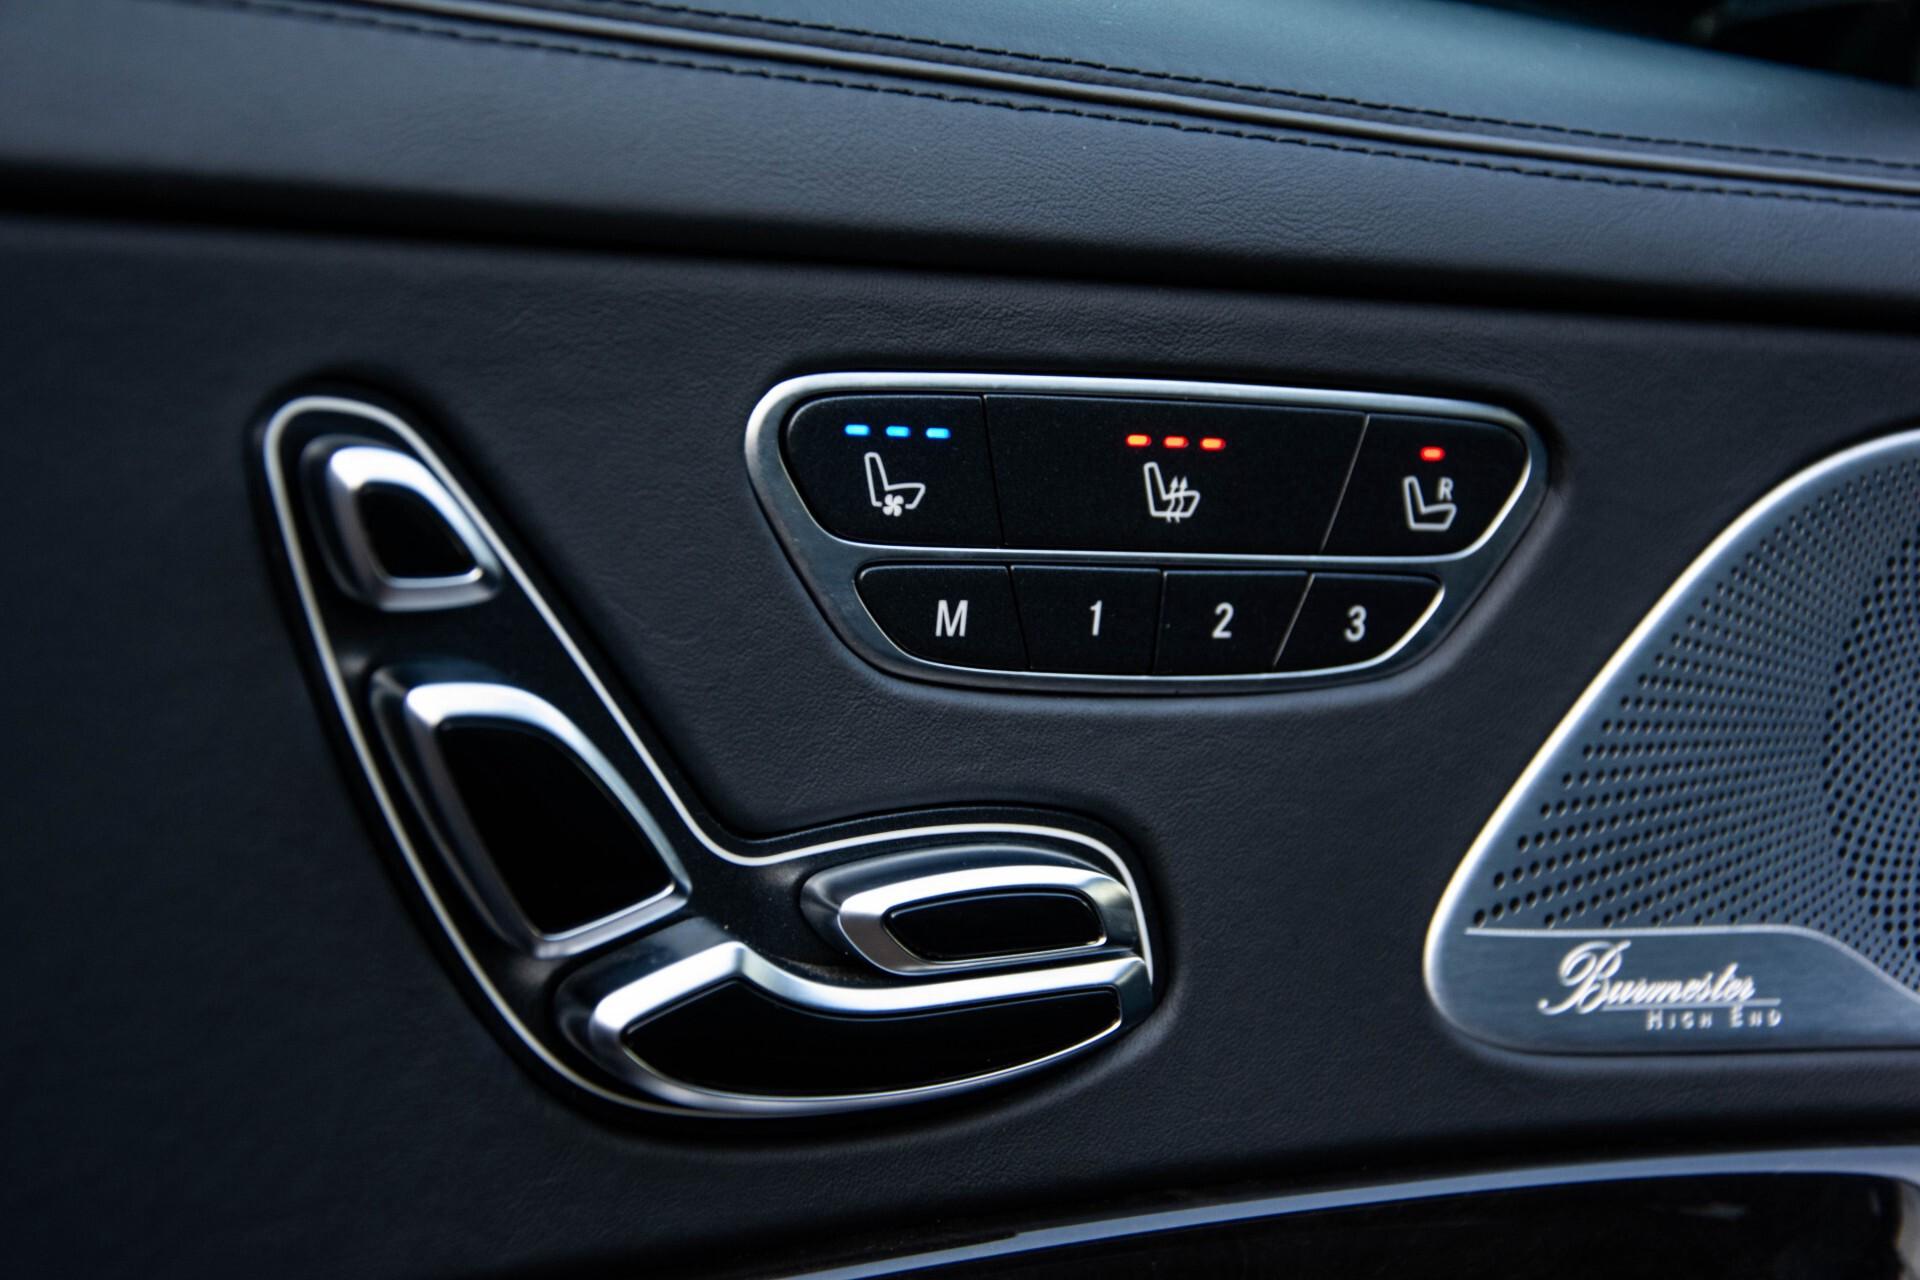 Mercedes-Benz S-Klasse 63 AMG Exclusive/Burmester High-End/Driverspack Aut7 Foto 28